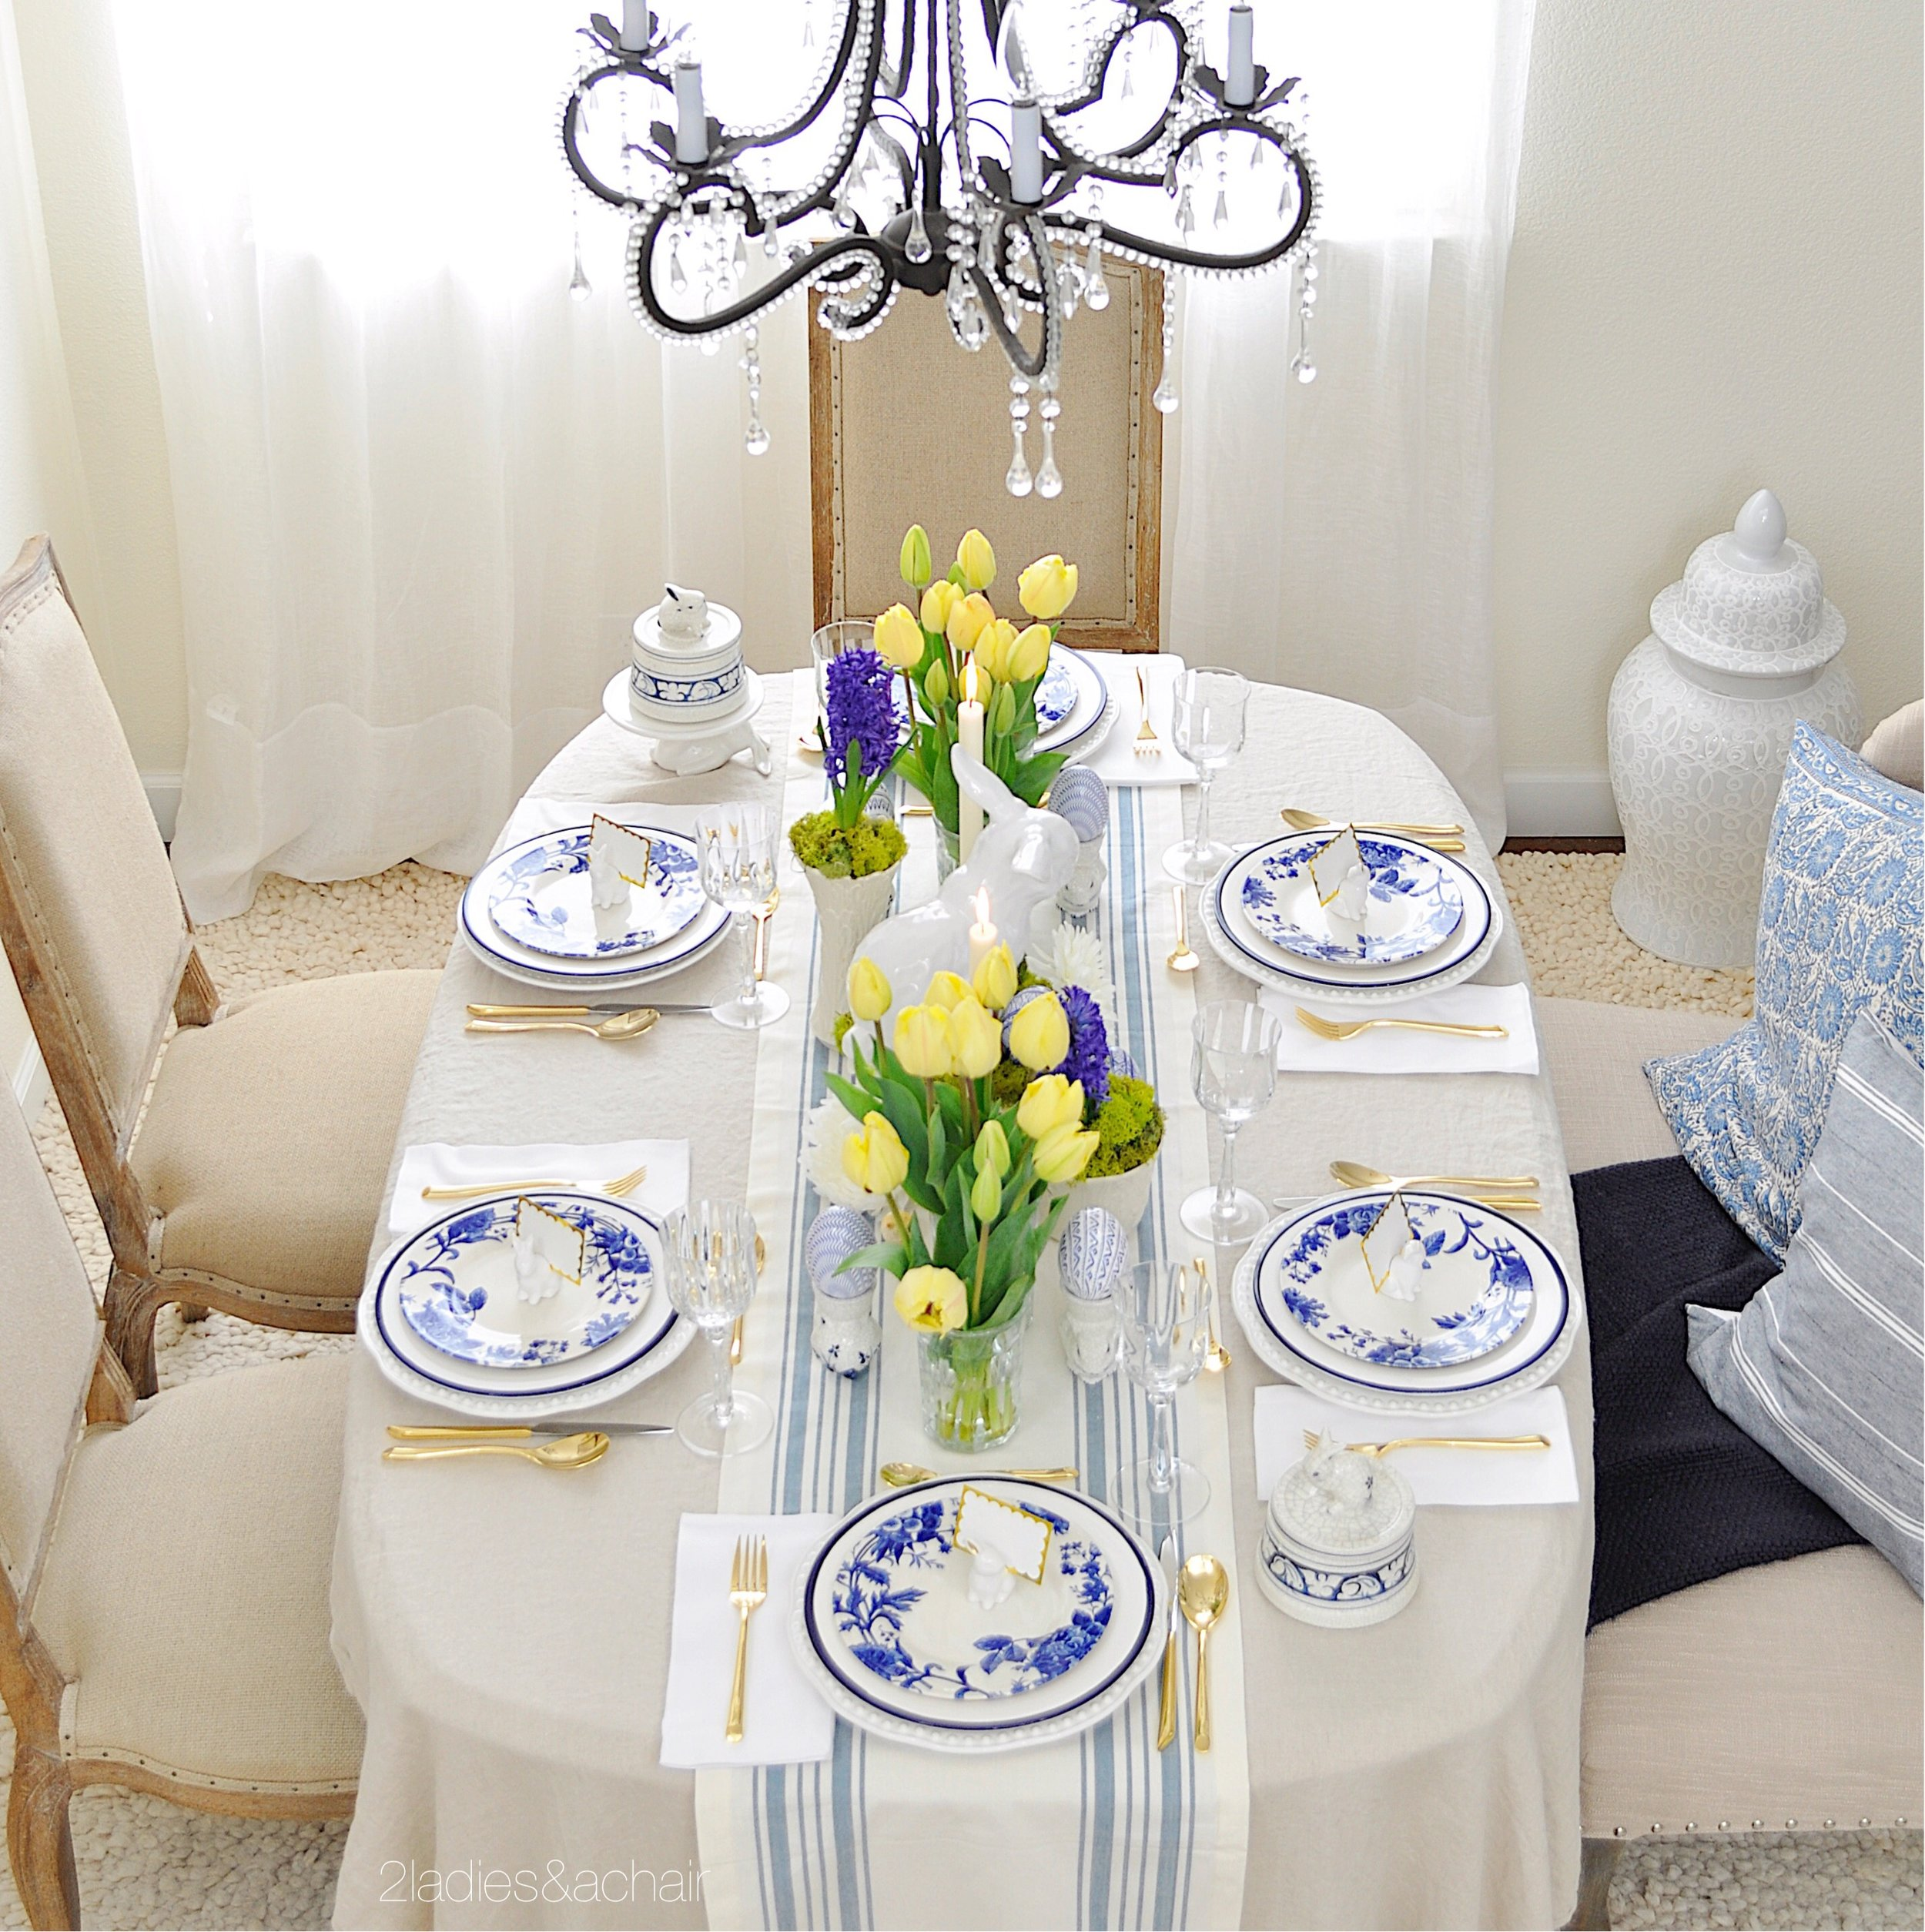 easter table IMG_1799.JPG